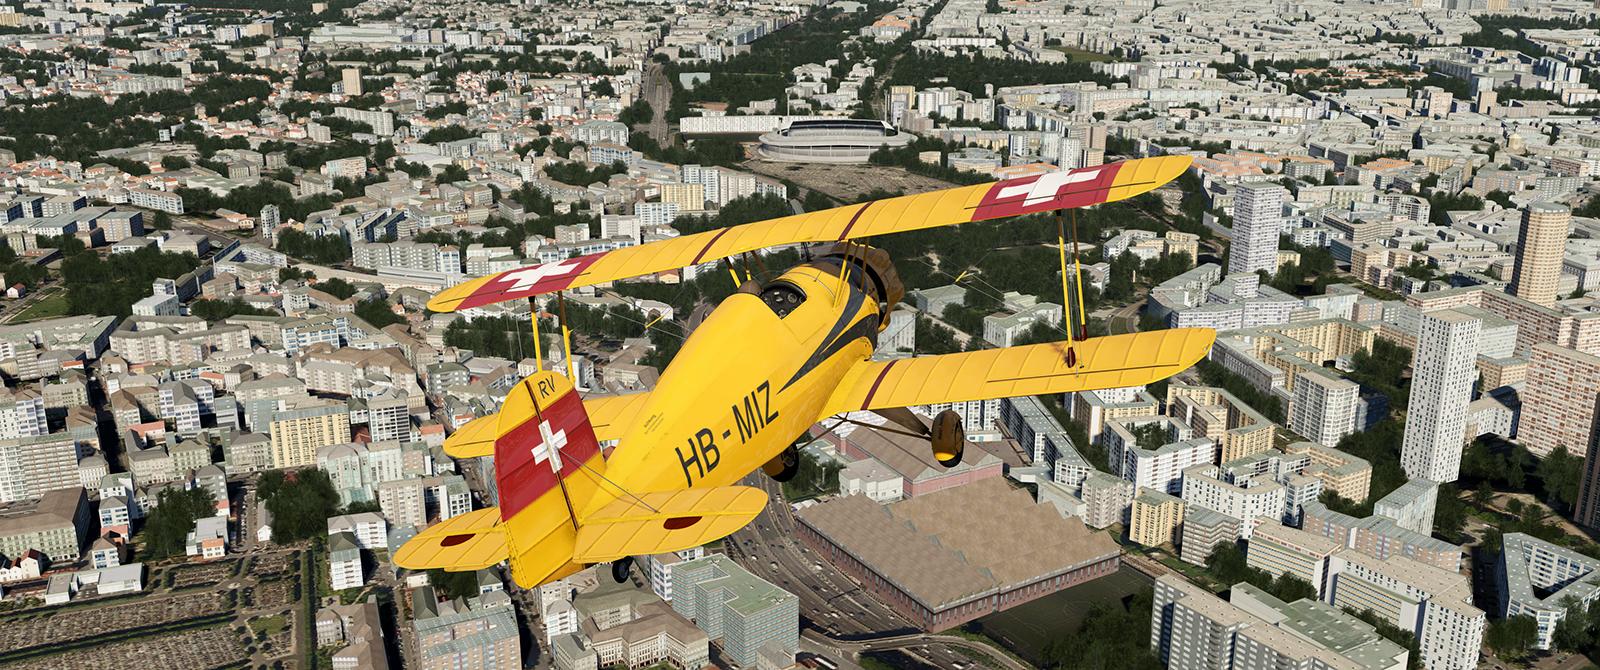 aerofly_fs_2_screenshot_38_20200126-1955